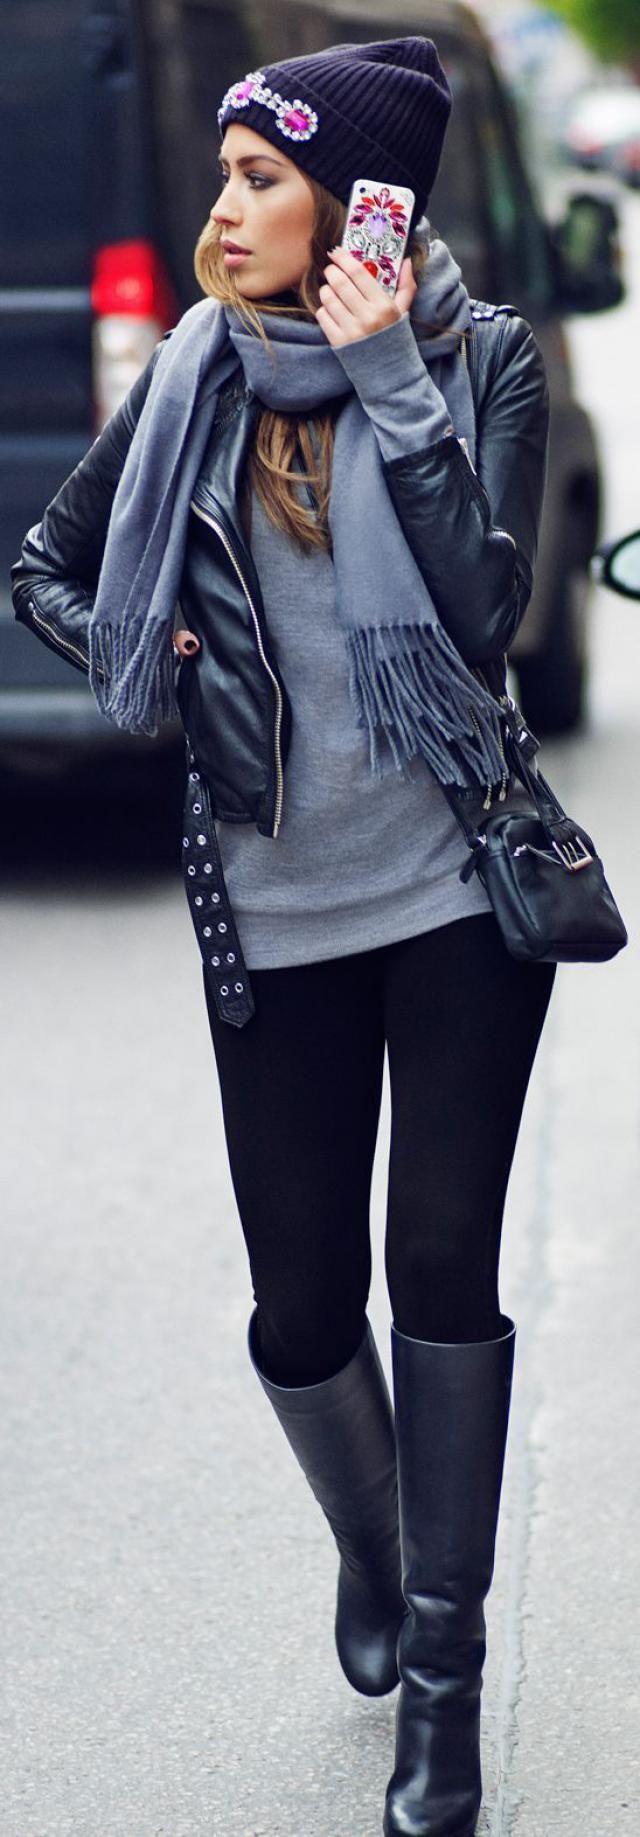 Fantastic jacket, women style!!!